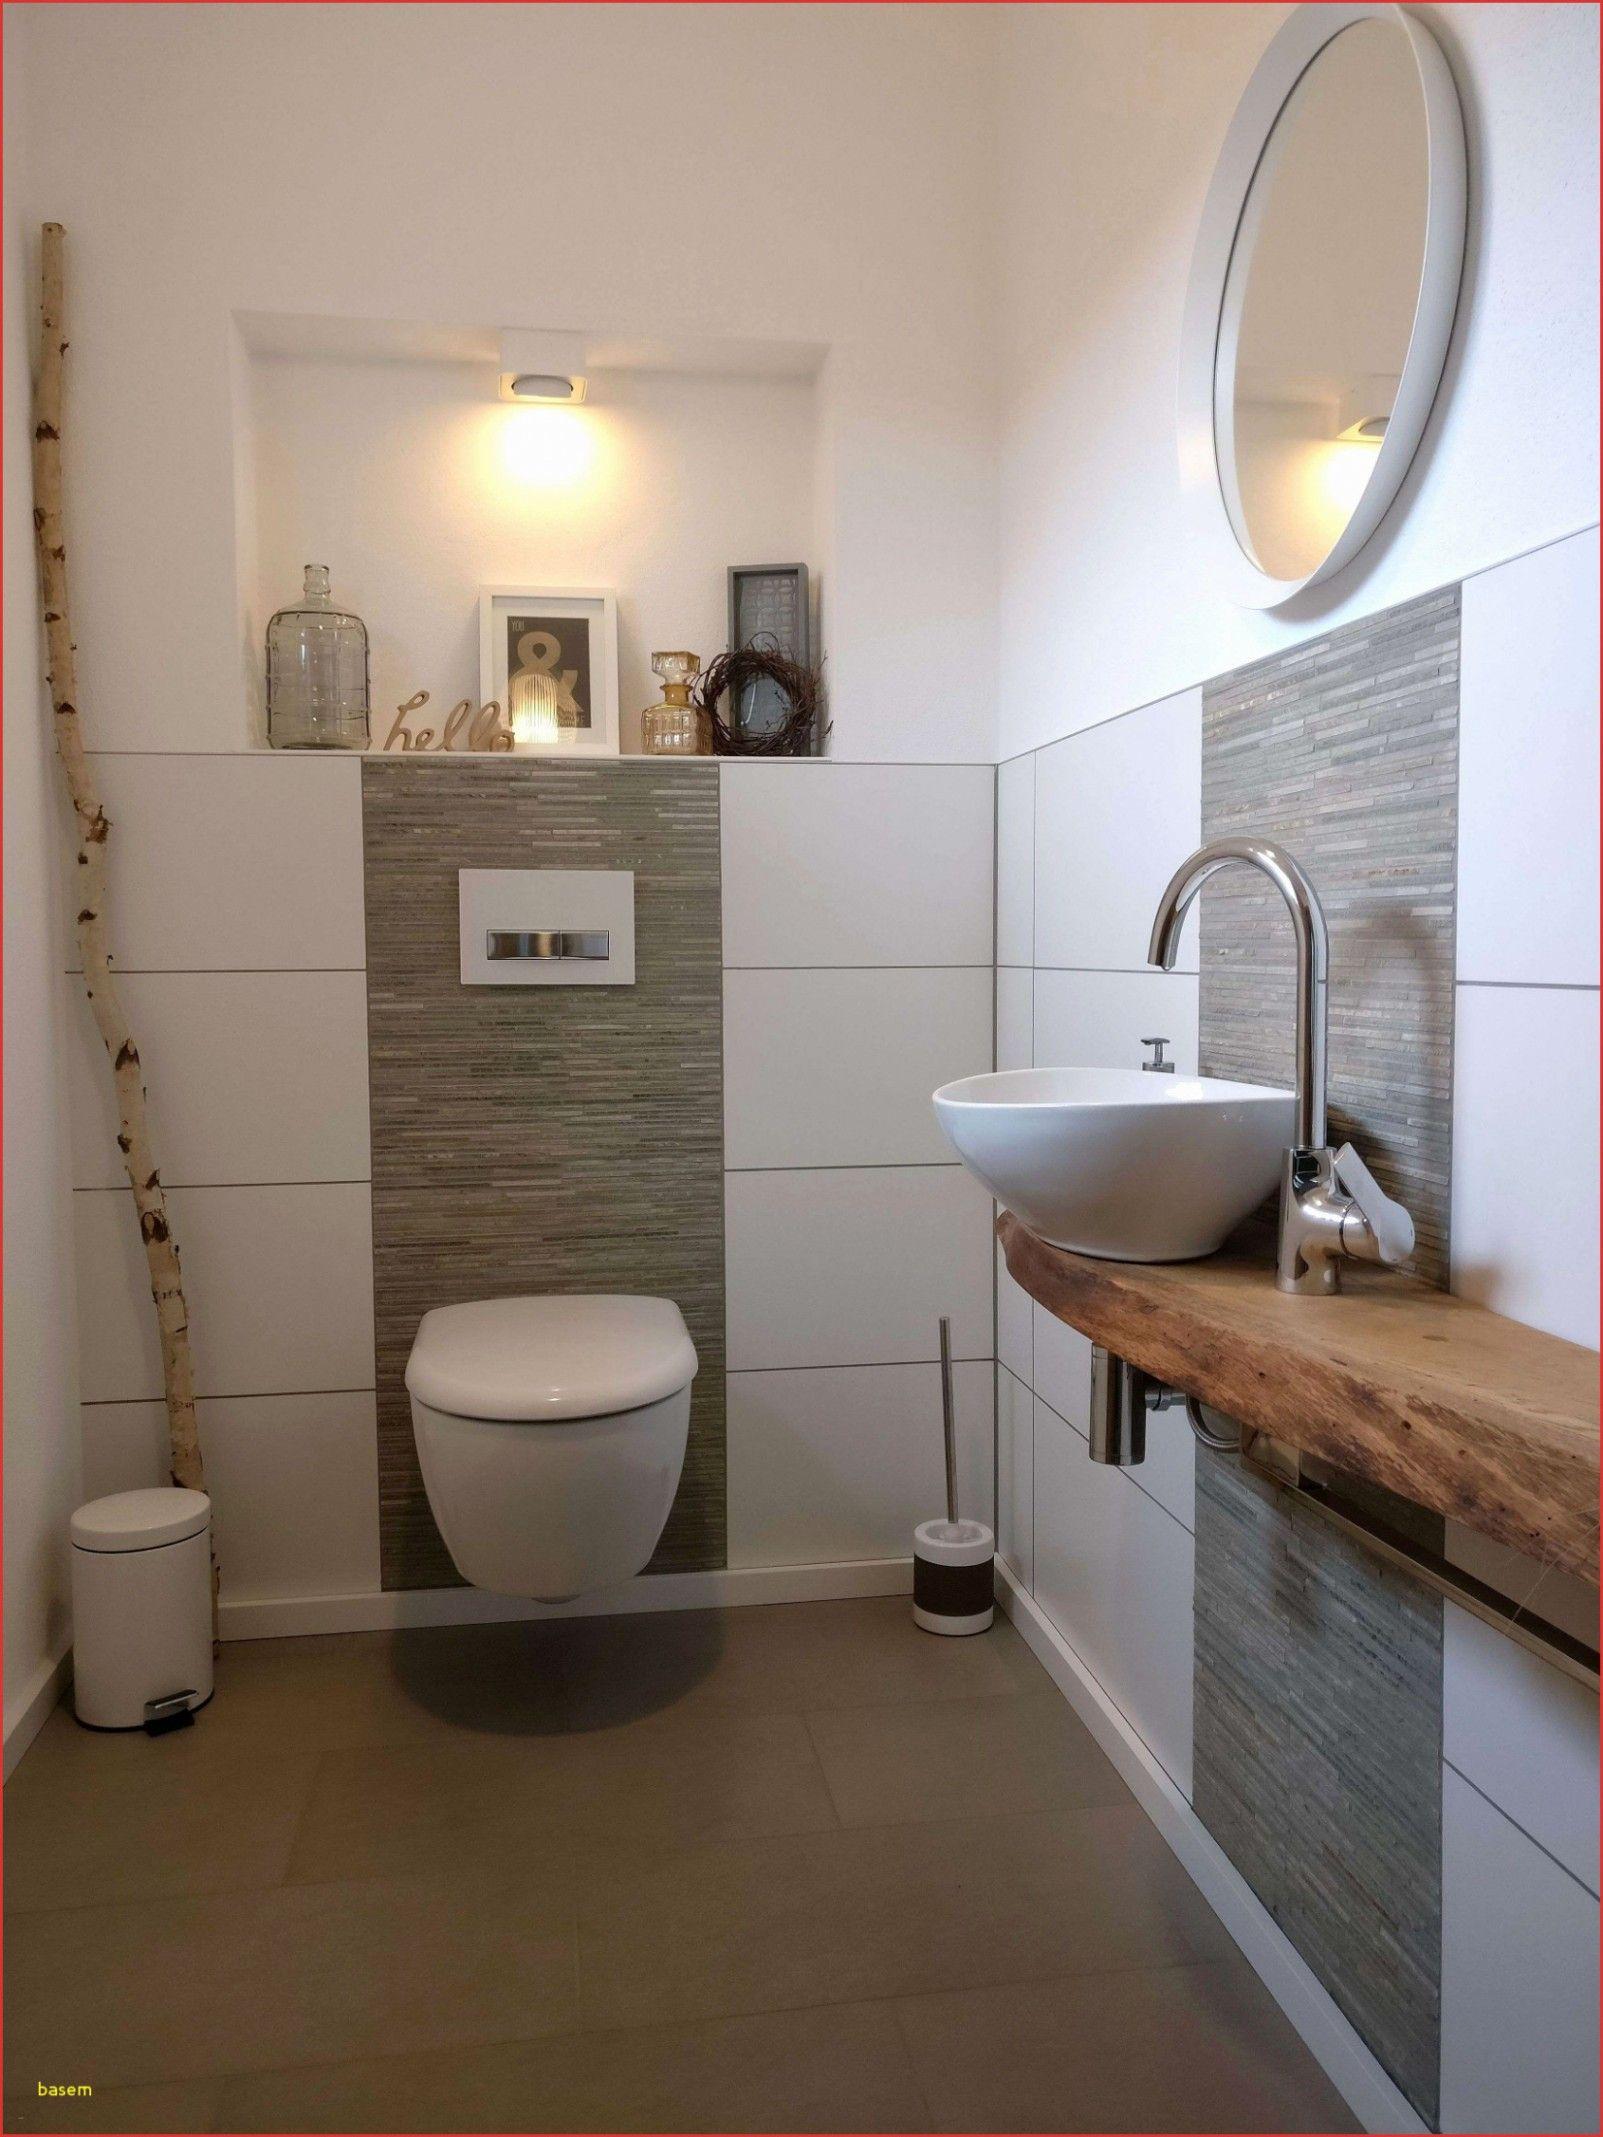 Fliesen Im Badezimmer Ideen Guest Toilet Modern Bathroom